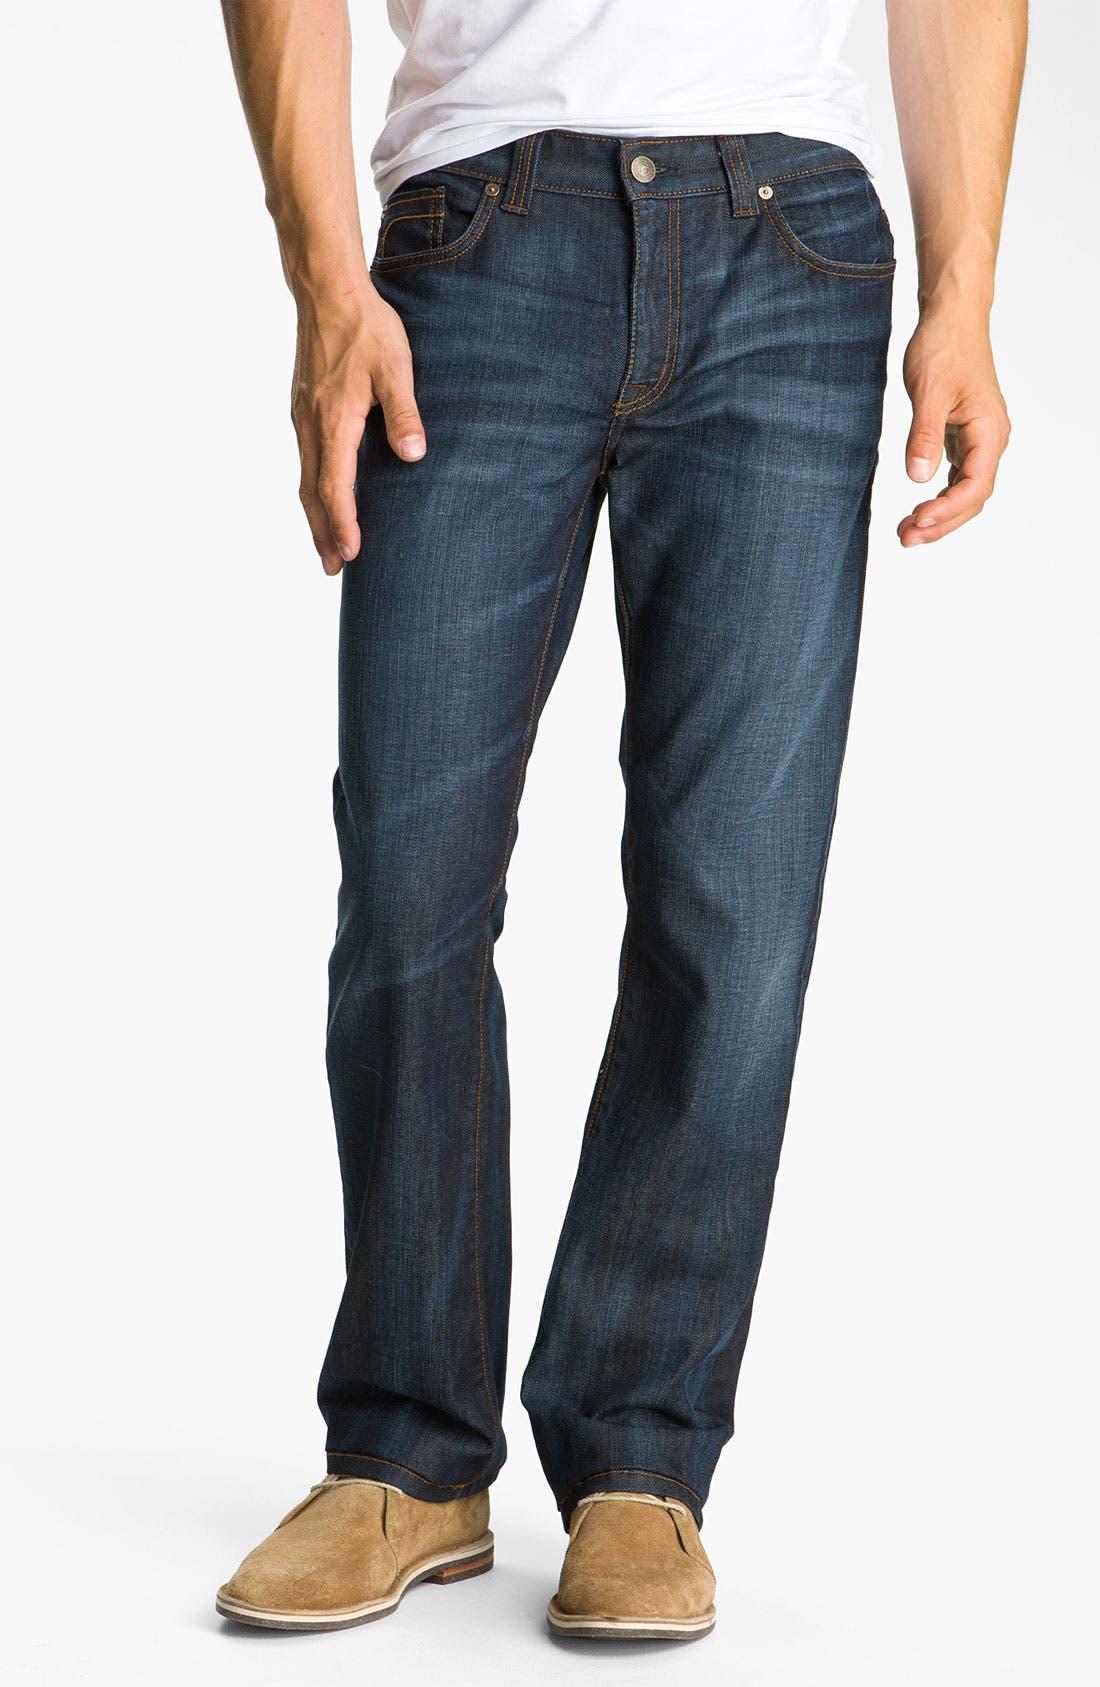 Main Image - Fidelity Denim 'Impala' Slim Straight Leg Jeans (Altmont Dark Vintage)